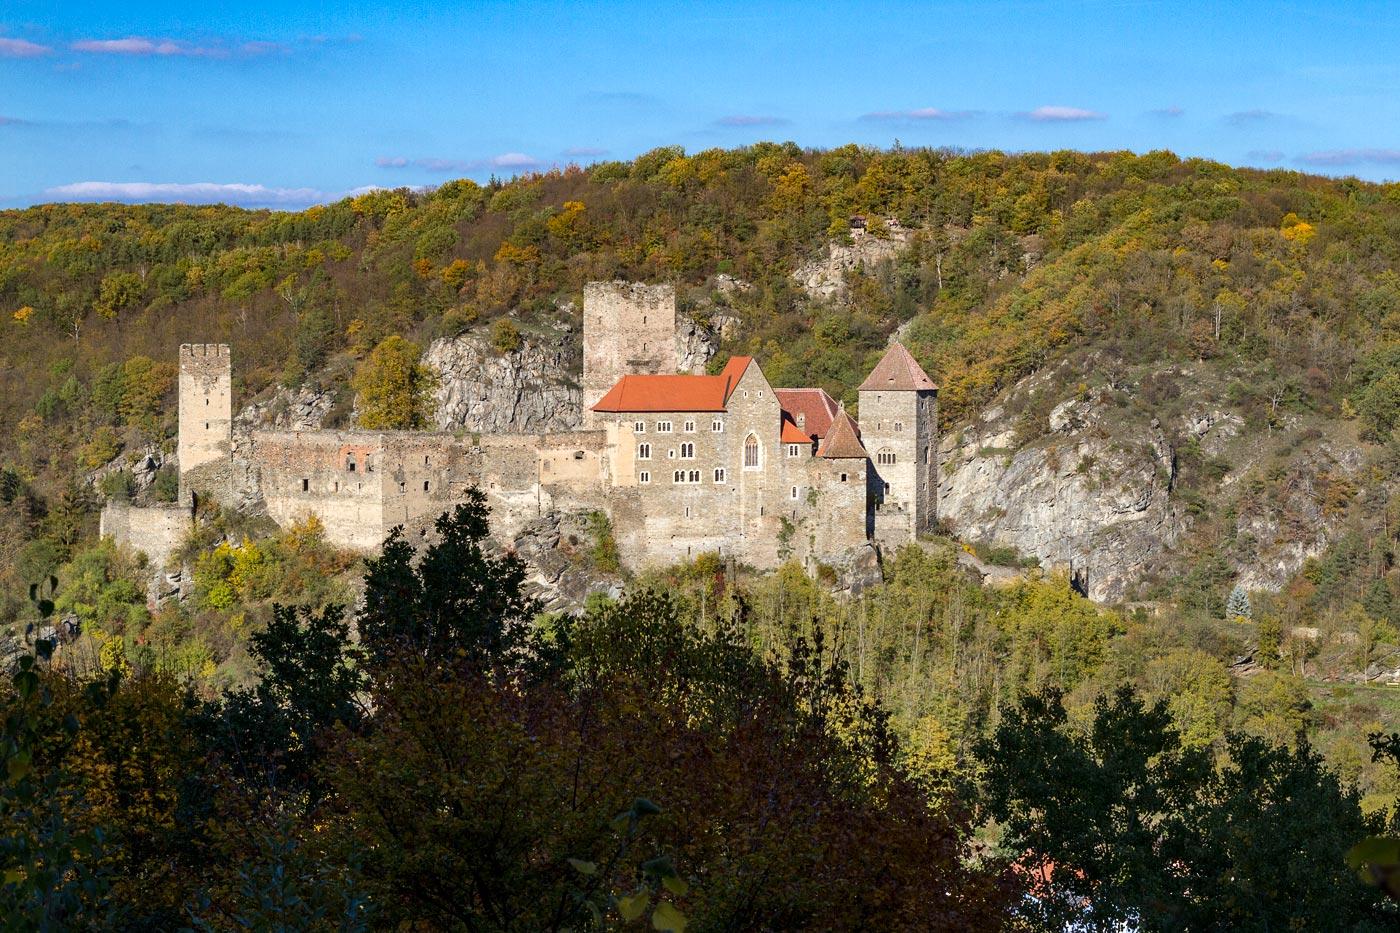 Крепость Хардегг (Hardegg), Австрия